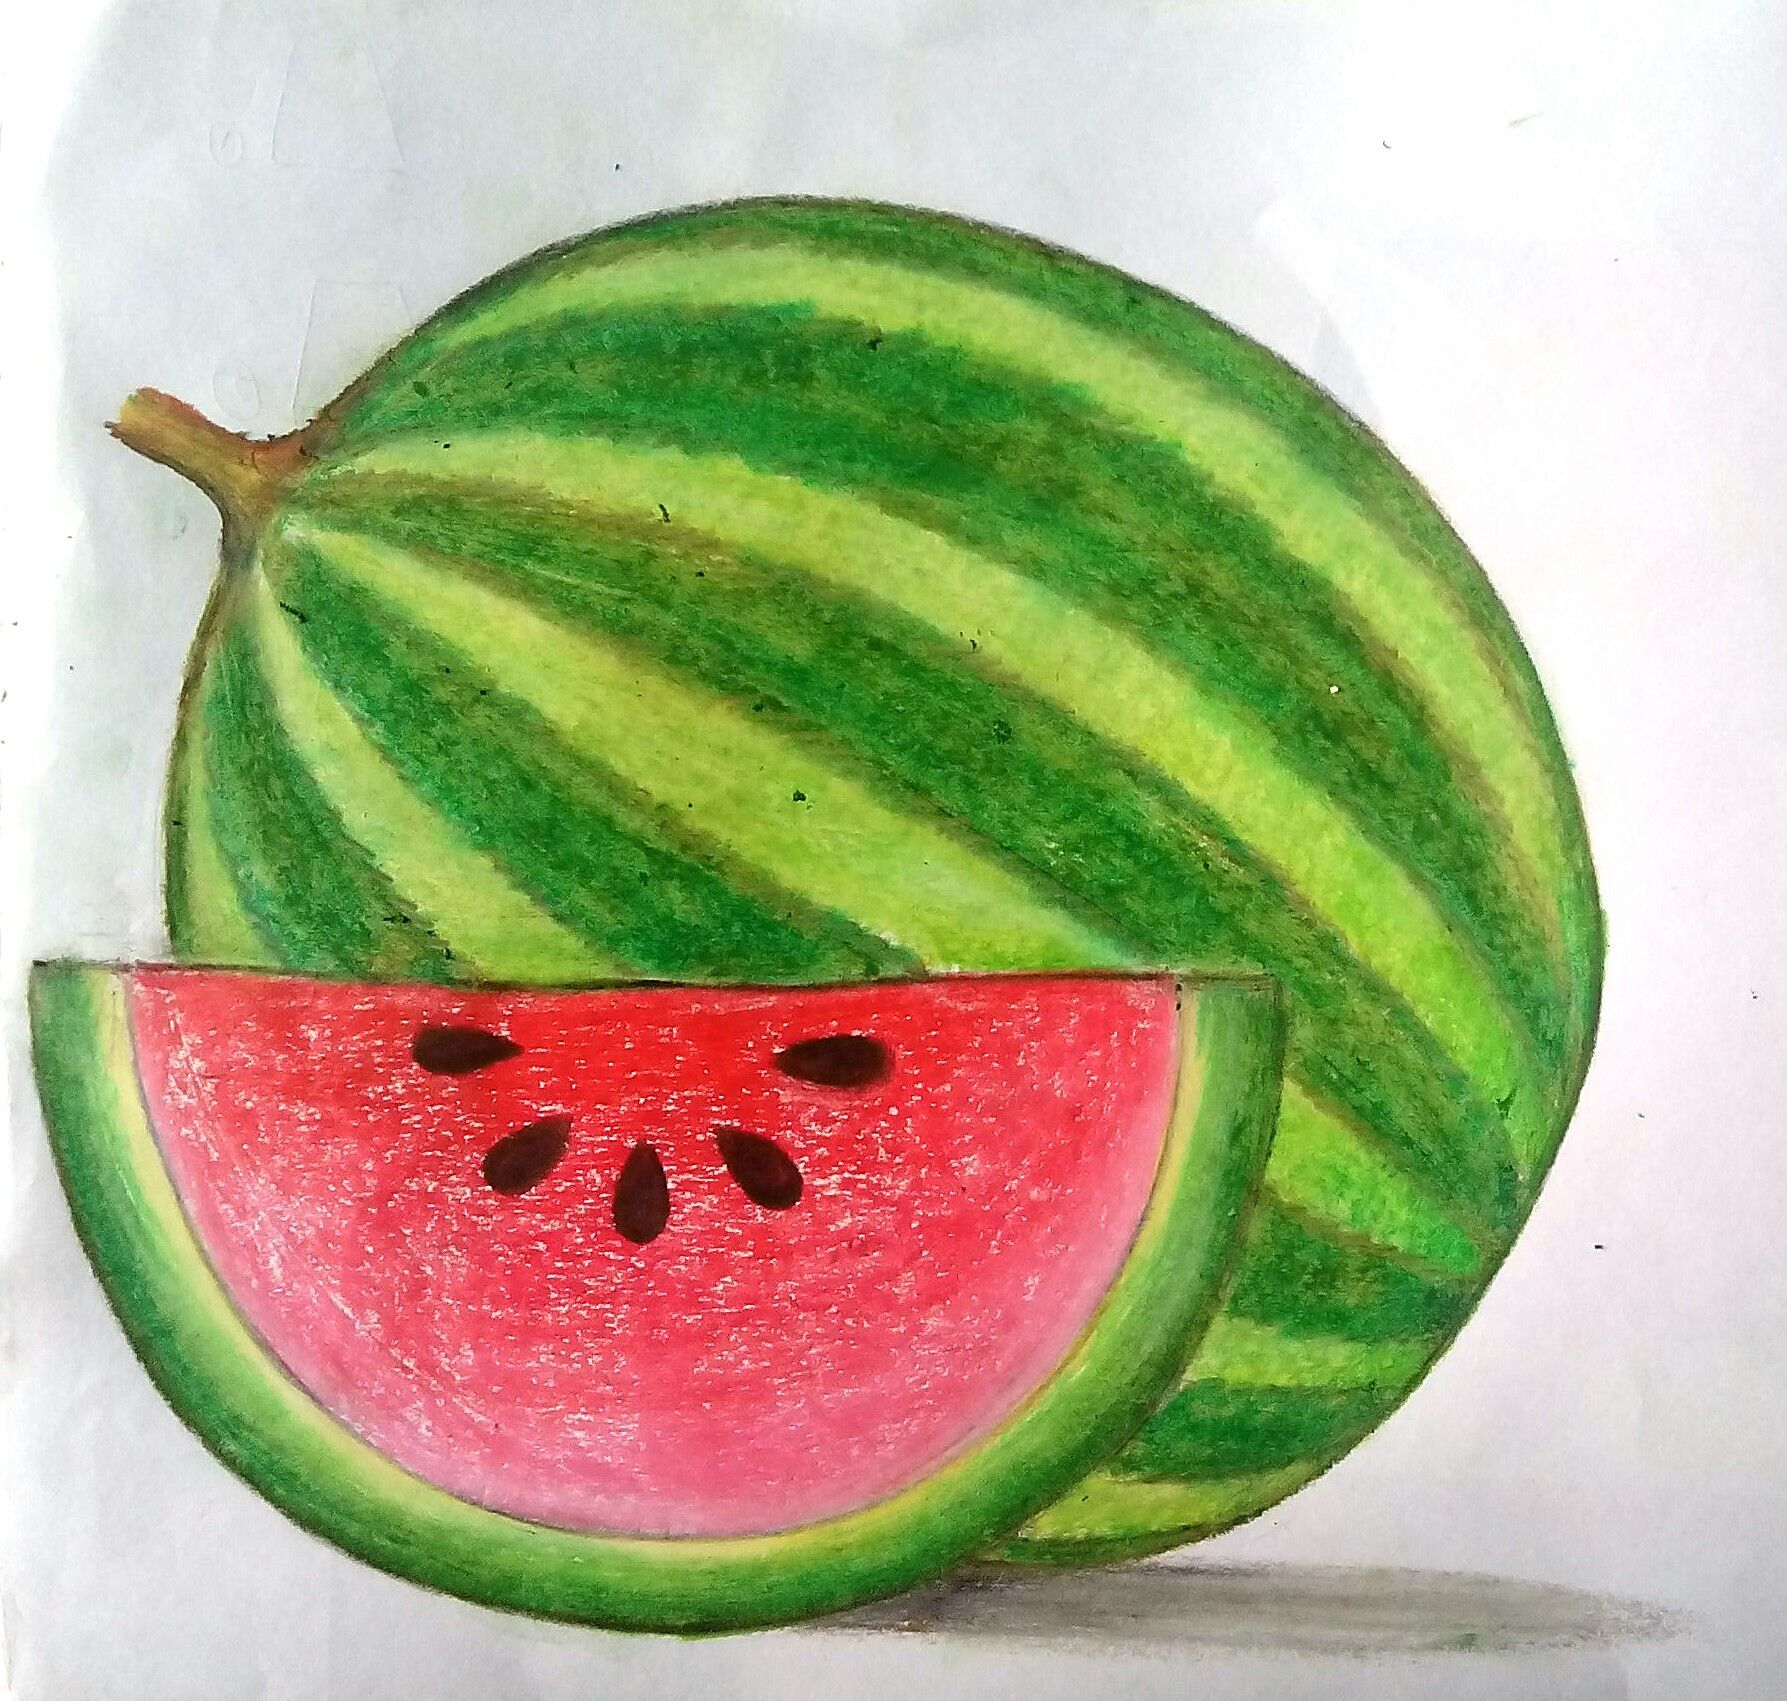 Pastel Colour Watermelon Watermelon Art Painting Fruits Drawing Oil Pastel